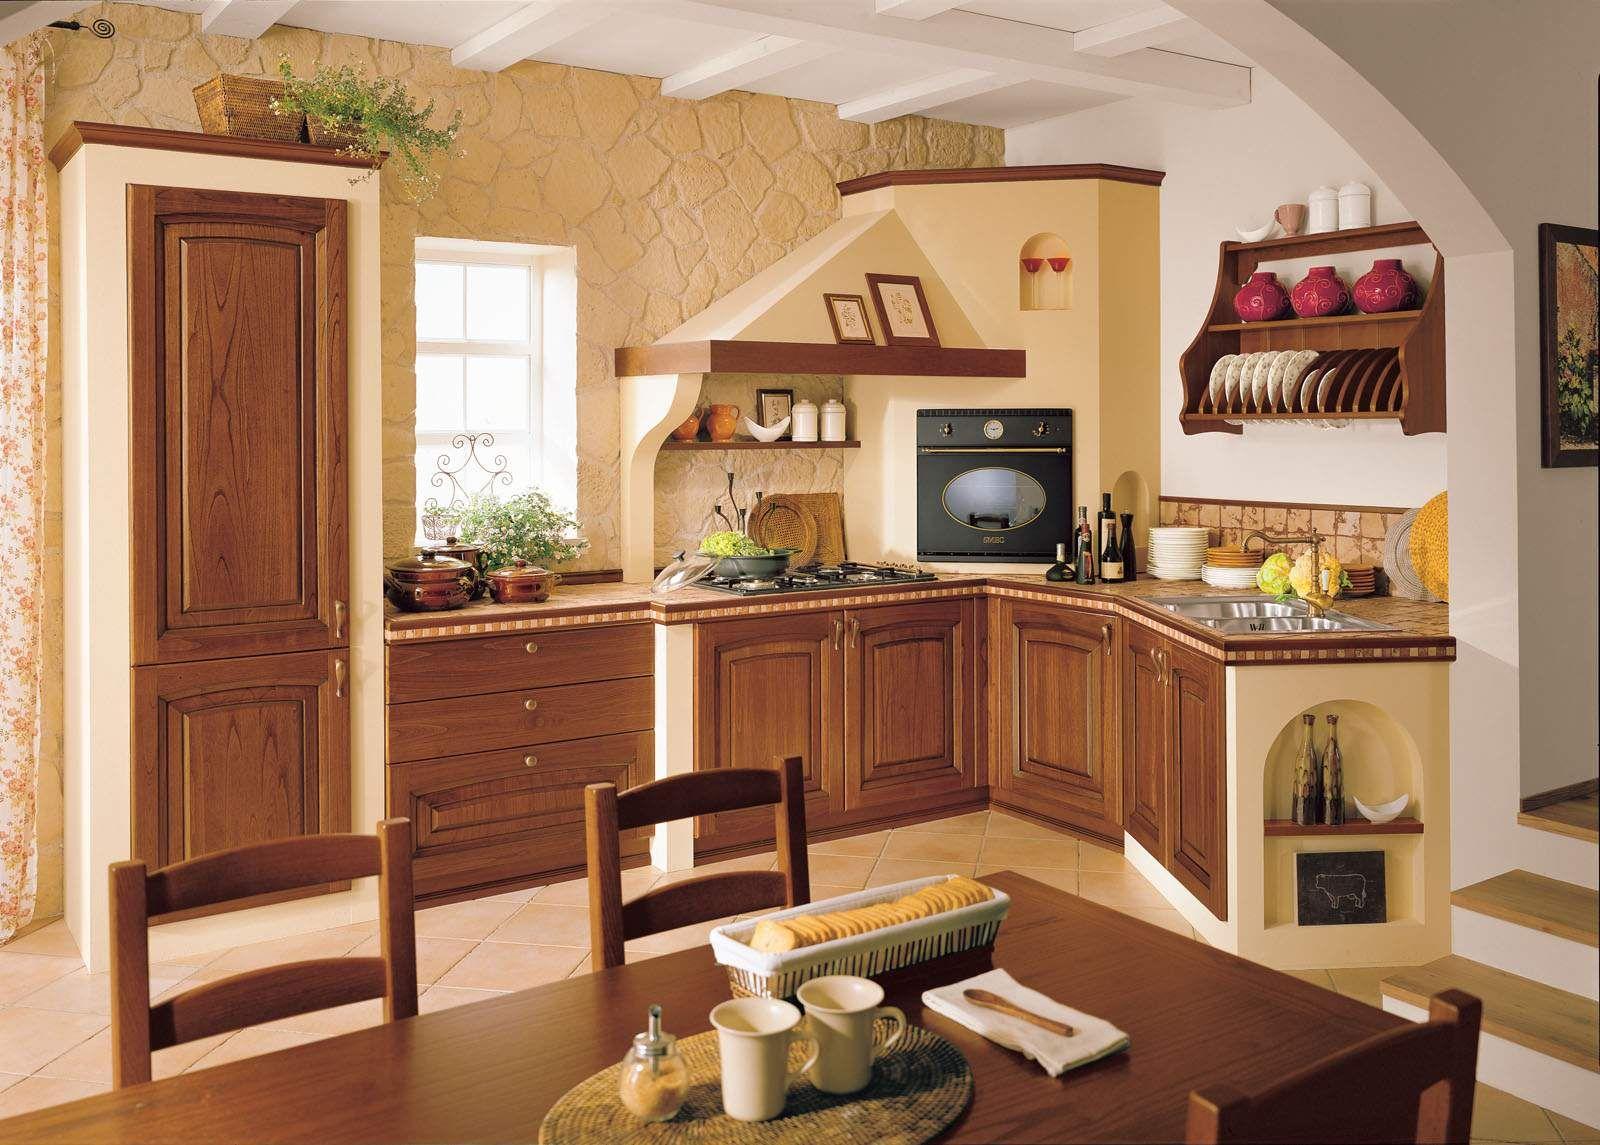 Forno Cucina In Muratura cucine in muratura • 70 idee per progettare una cucina